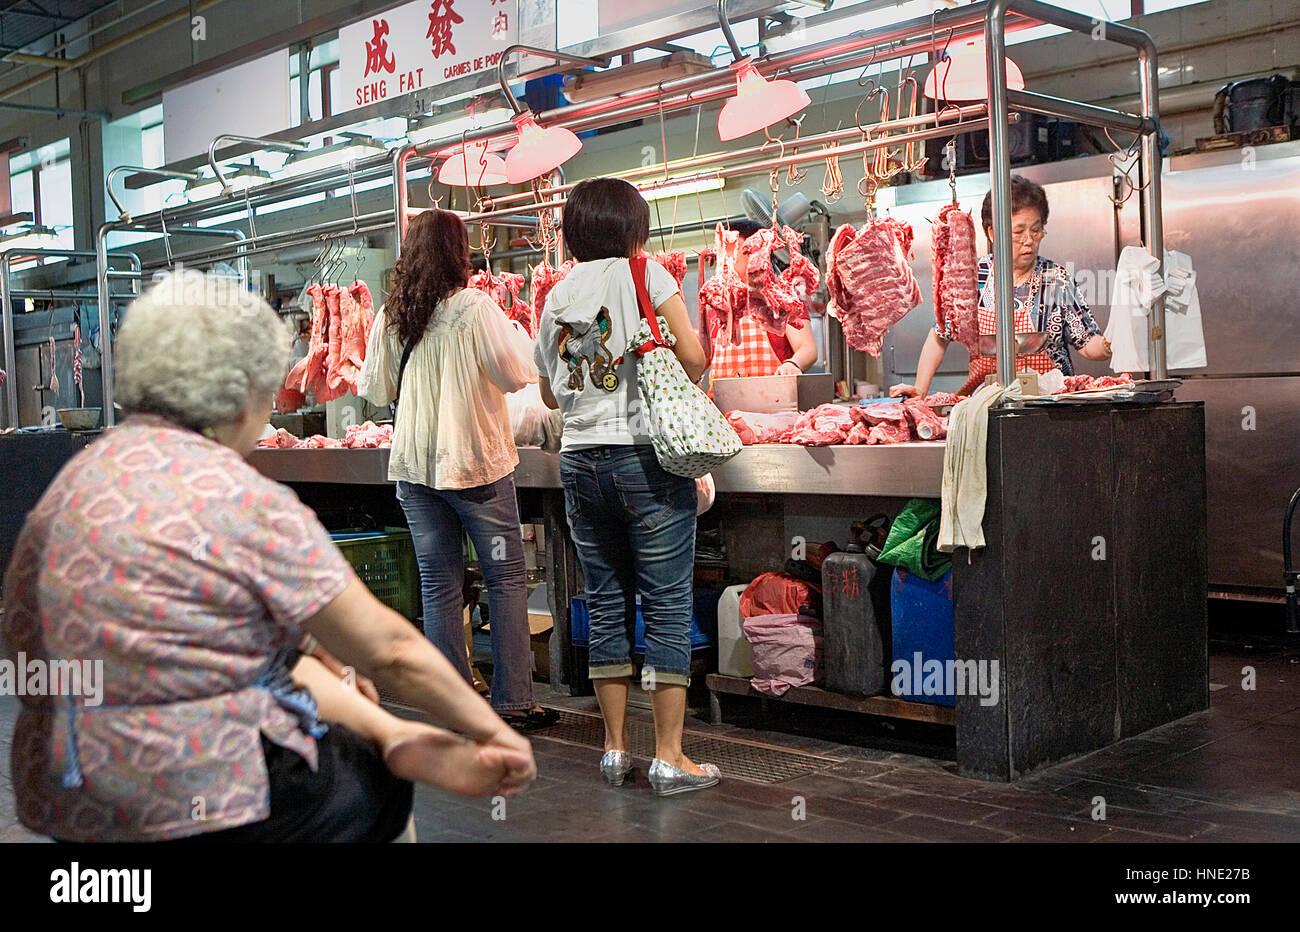 Sao Domingos market,Macau,China - Stock Image